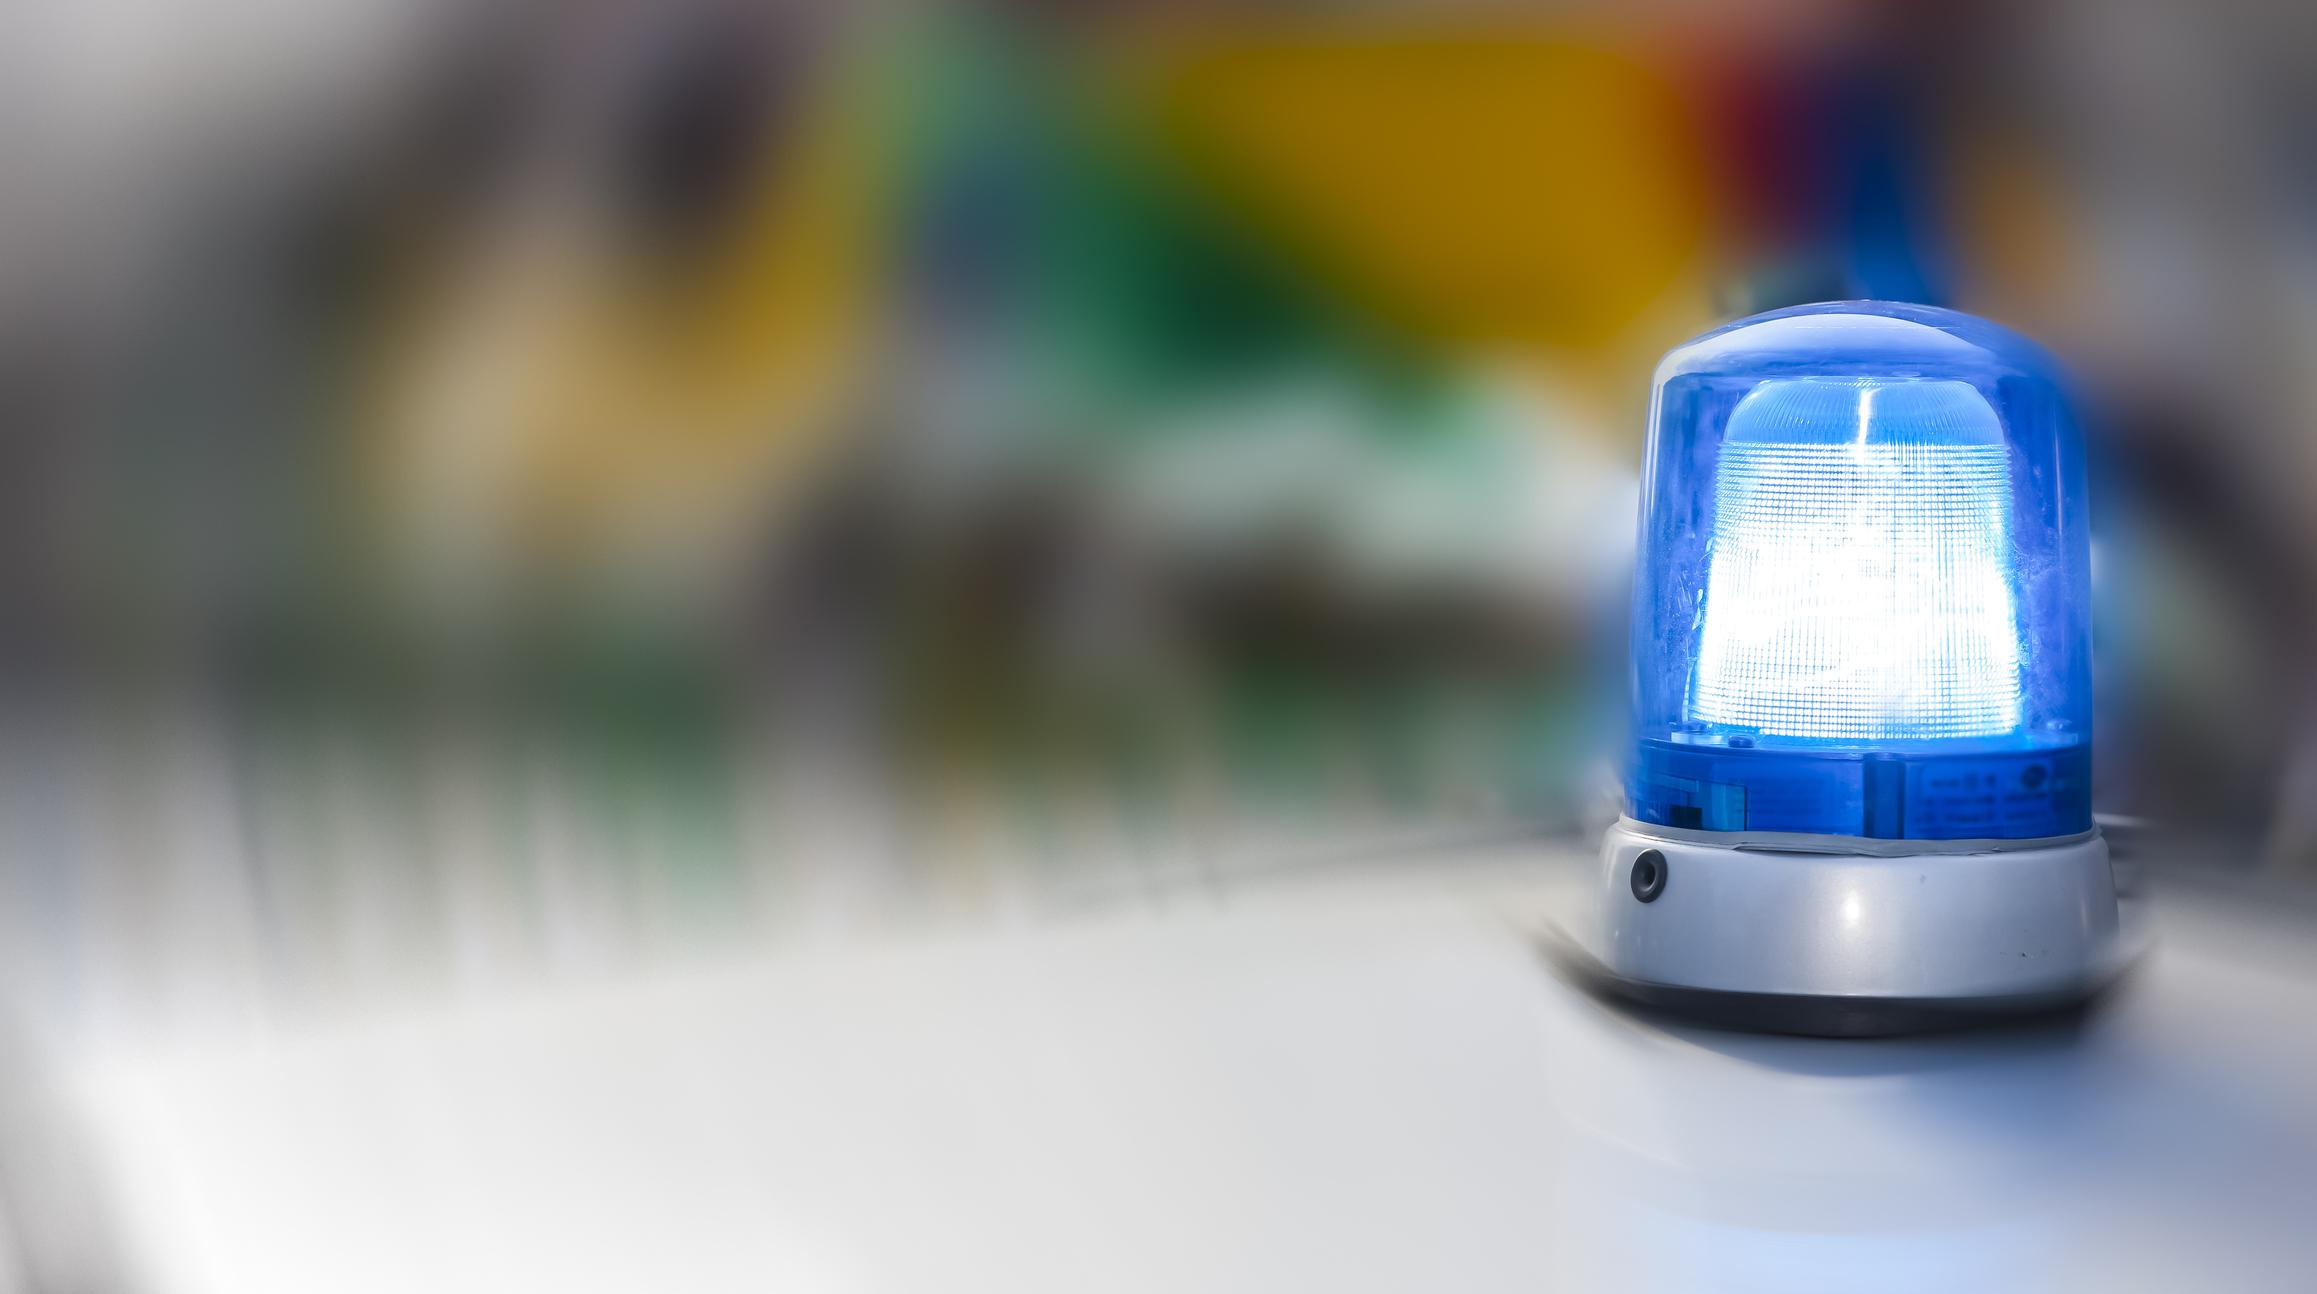 Blue light on police car, close-up